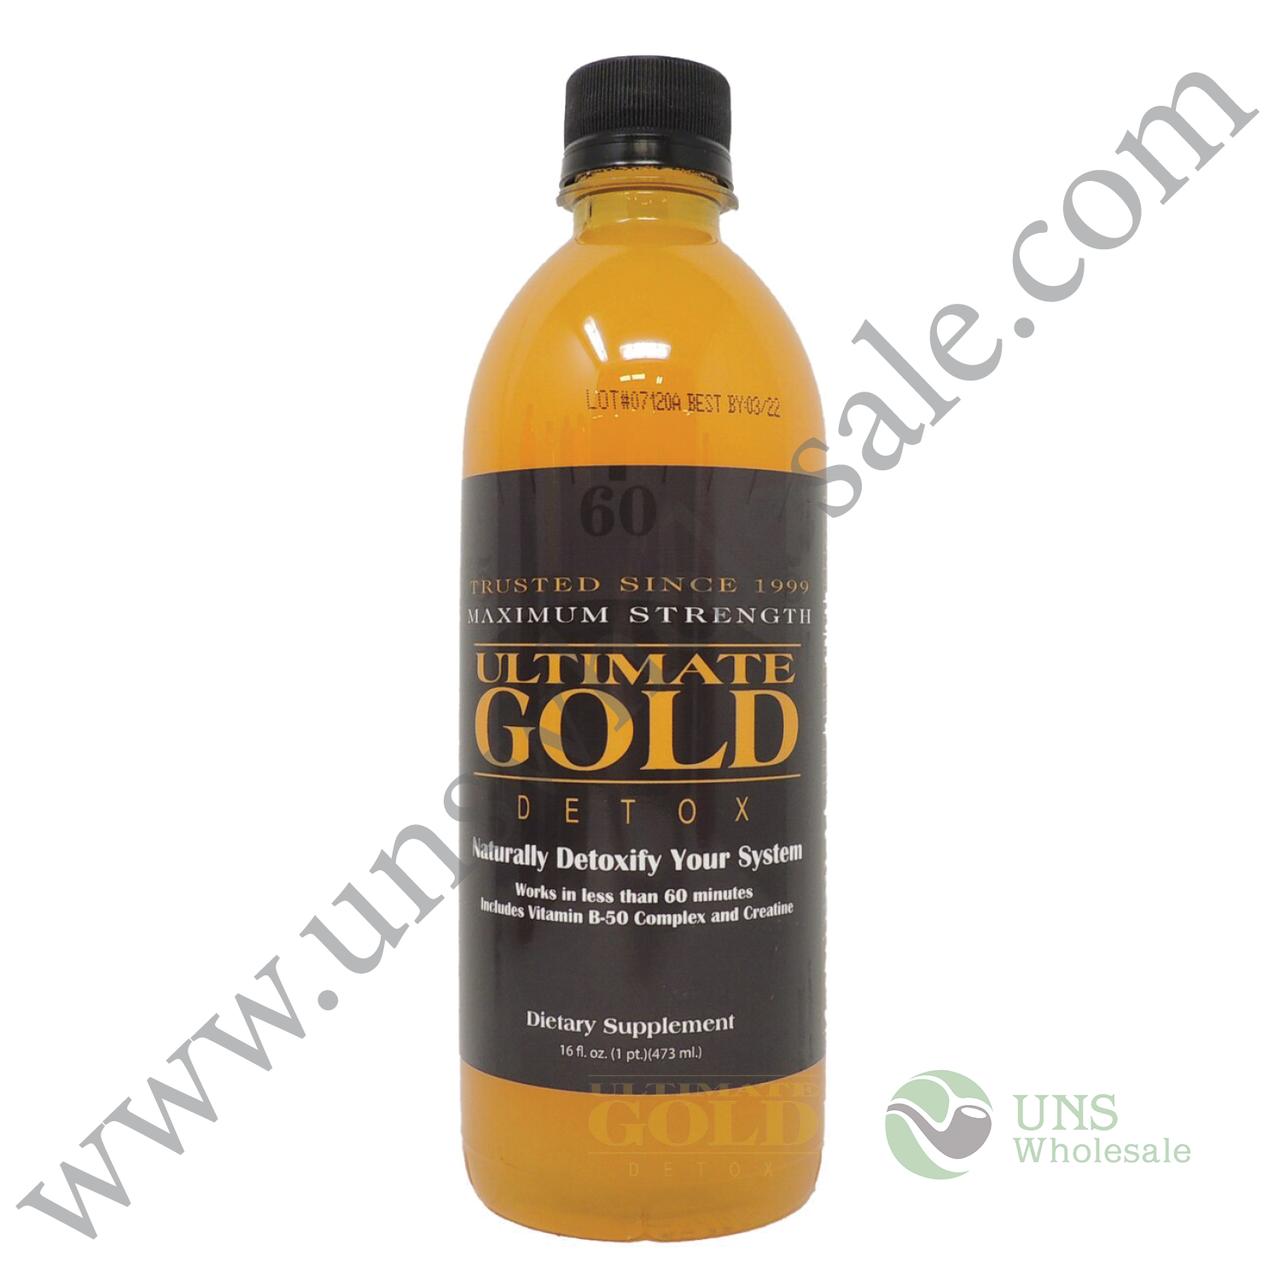 Ultimate Gold Detox (16oz, 20oz) UNS Wholesale Smoke Shop Head Shop Novelty Supplies